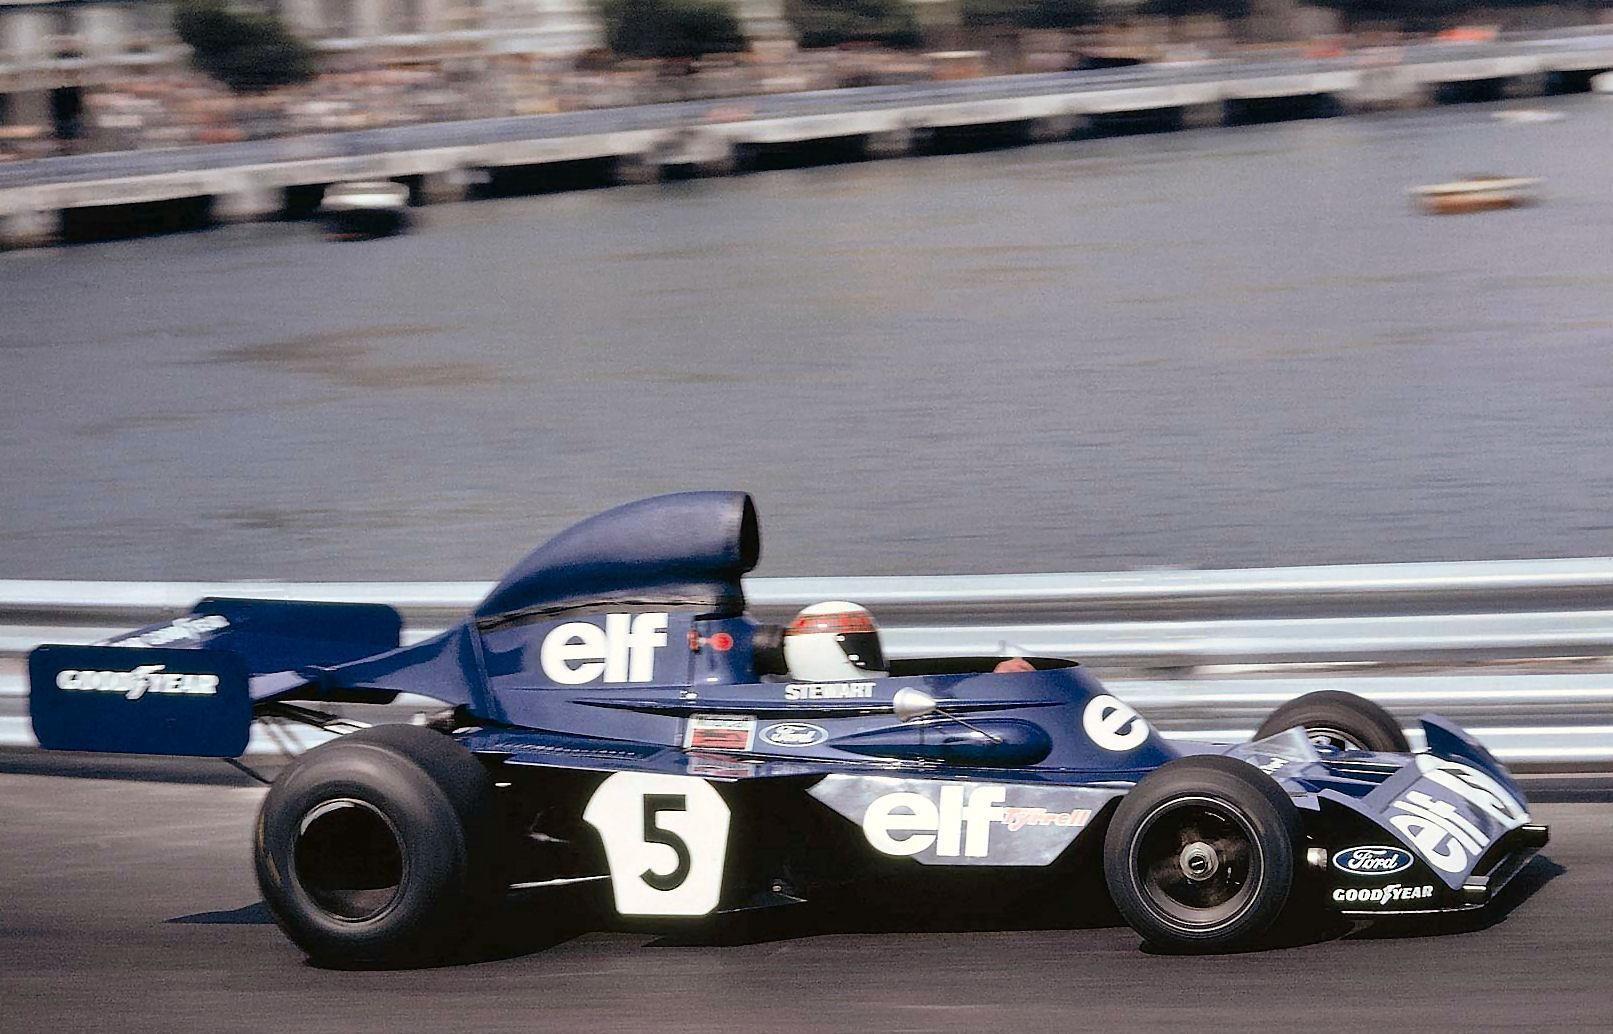 Tyrrell 006/2, Jackie Stewart, 1973 | Jackie stewart, Racing ...